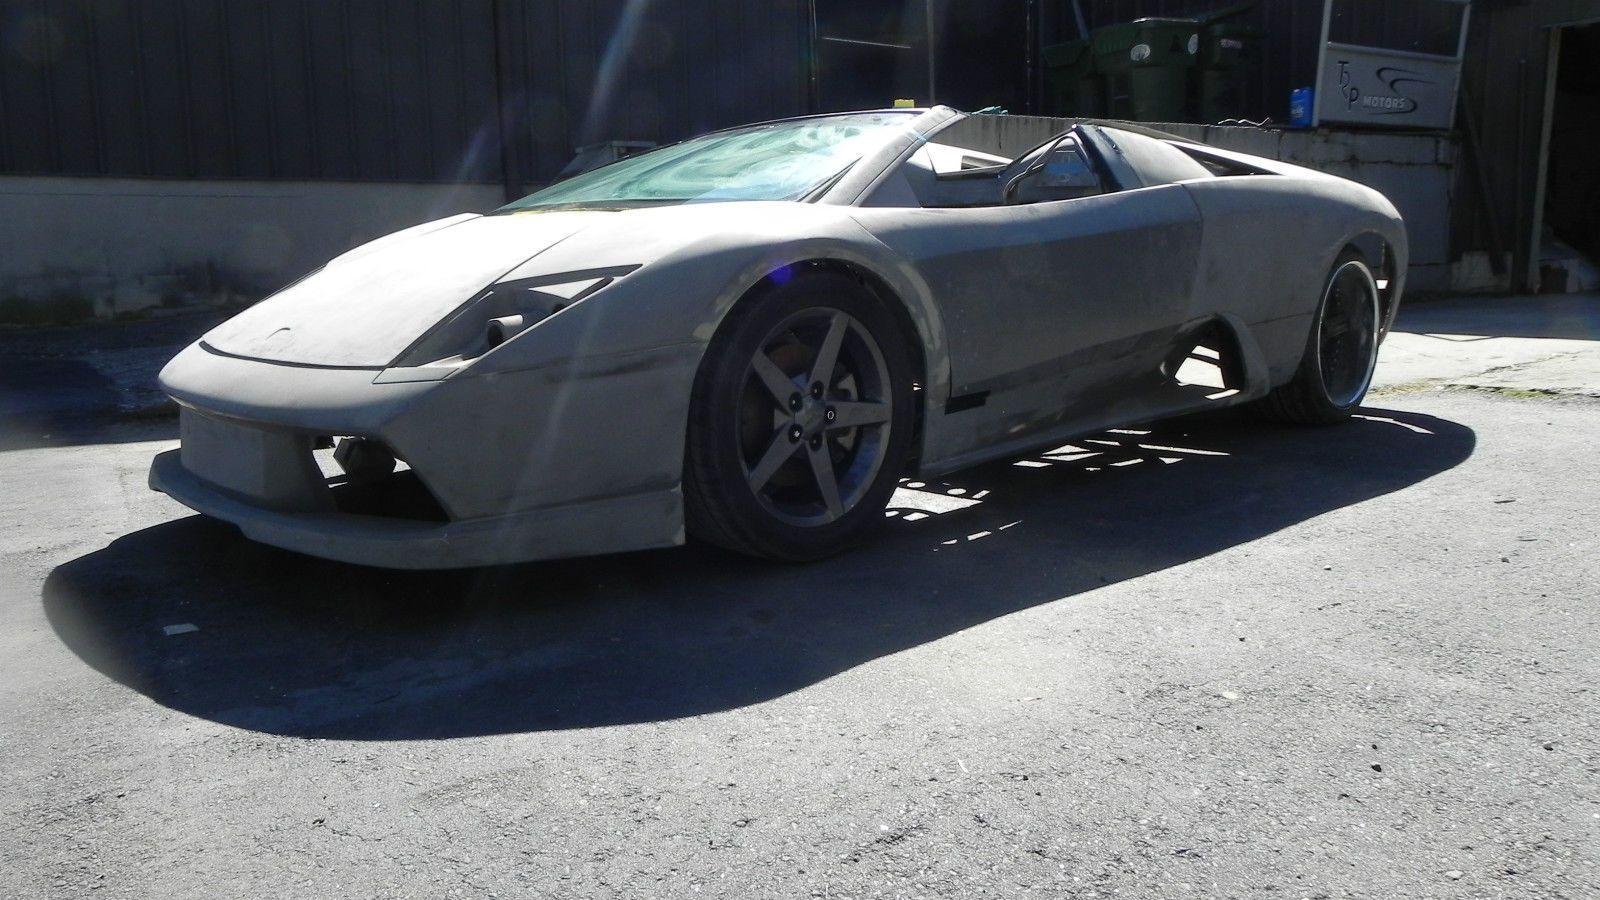 2005 Lamborghini Murcielago Roadster Kit Car Tube Frame BMW V12 ...